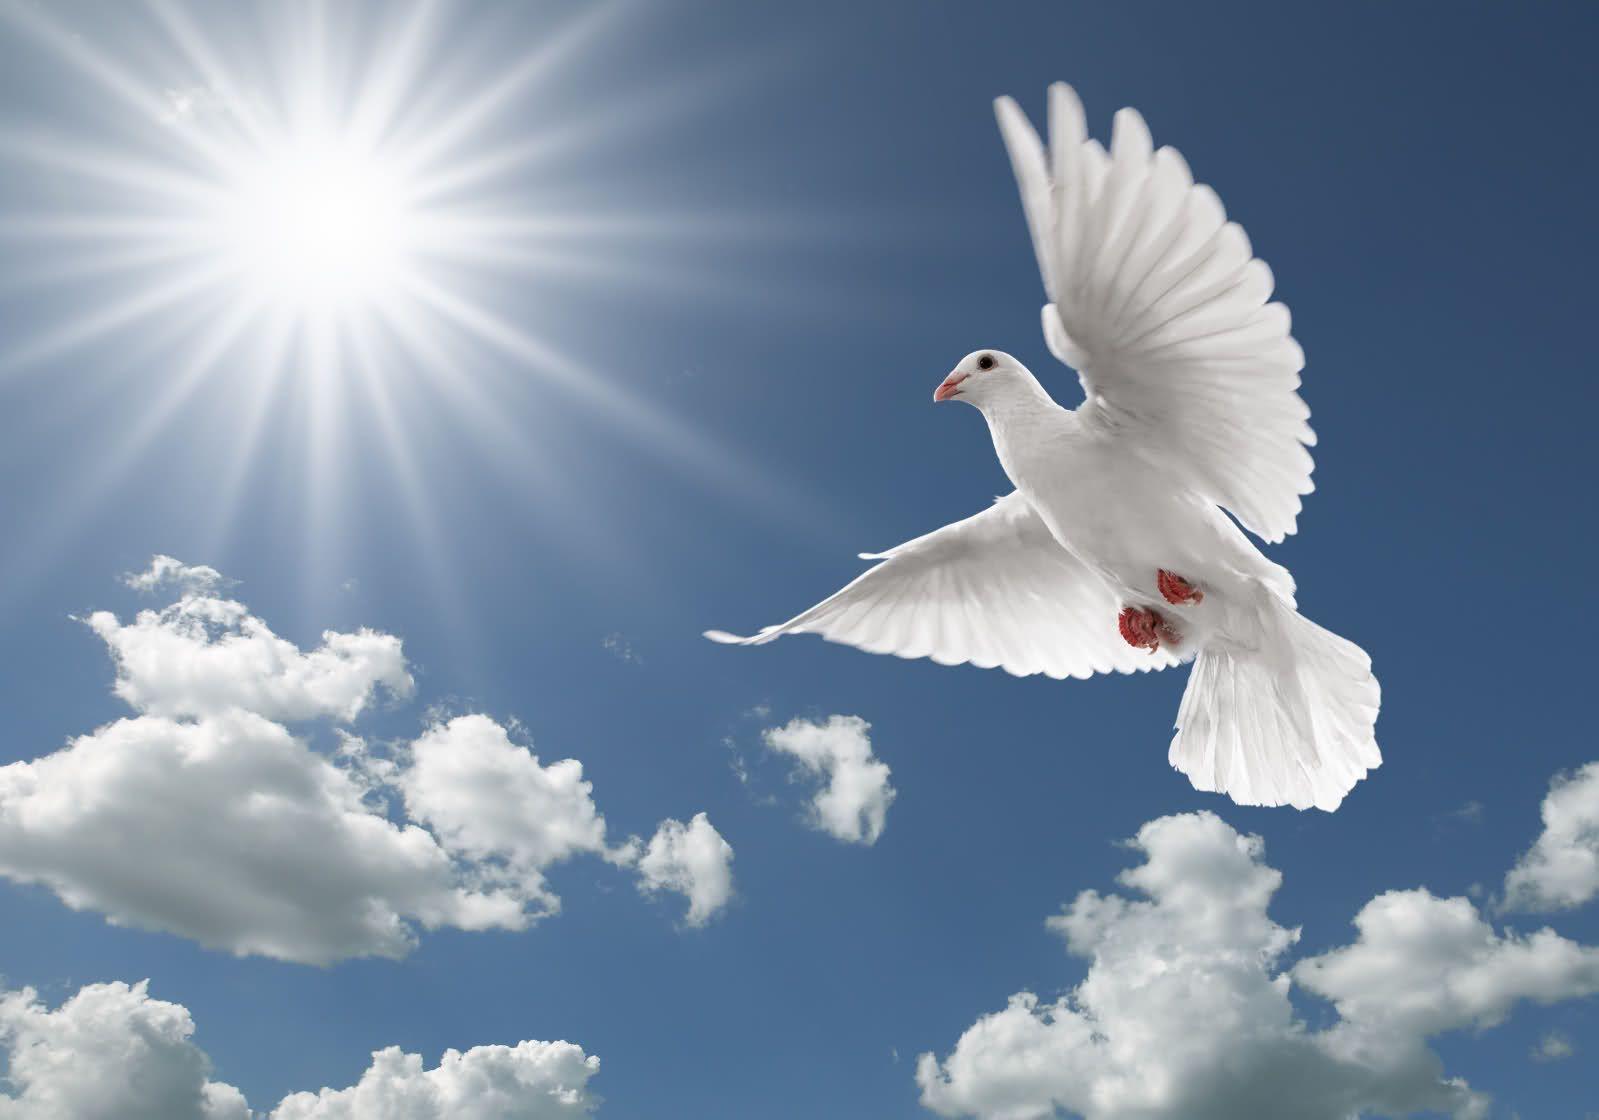 Flying Birds Wallpapers Hd Wallpapers N Birds Dove - Flying Birds Images Download , HD Wallpaper & Backgrounds